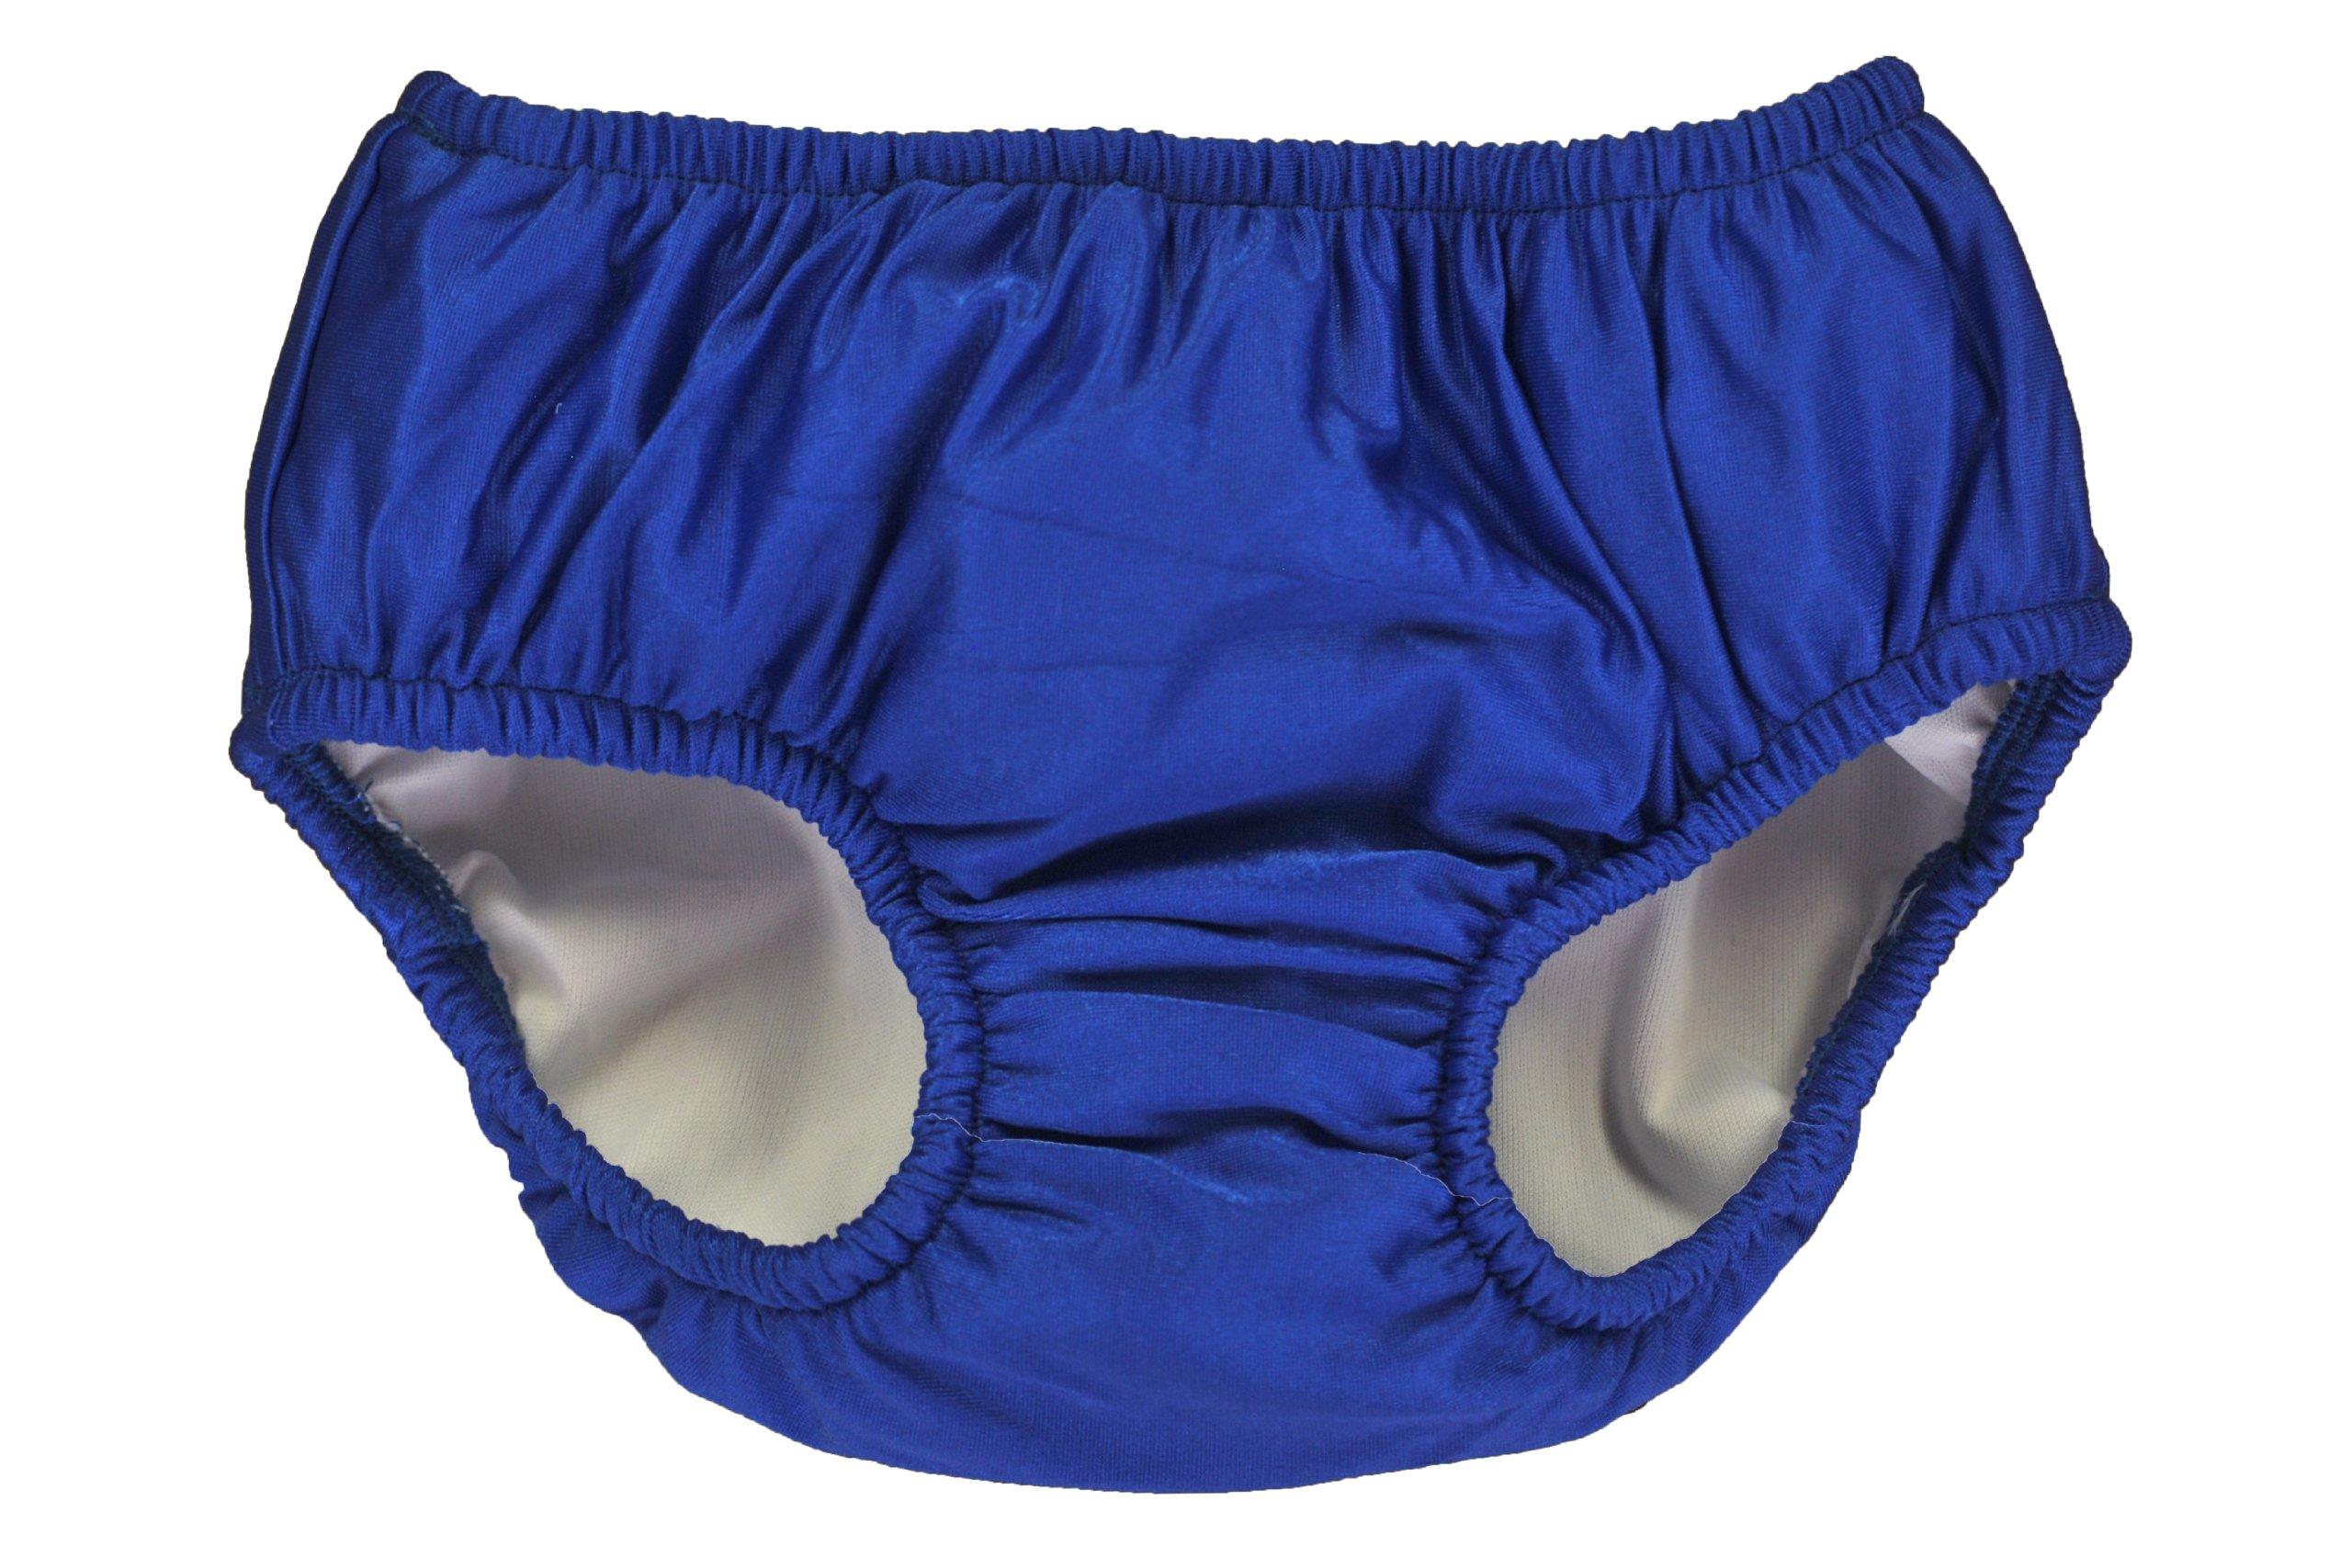 my pool pal disposable swim diaper white 3t baby